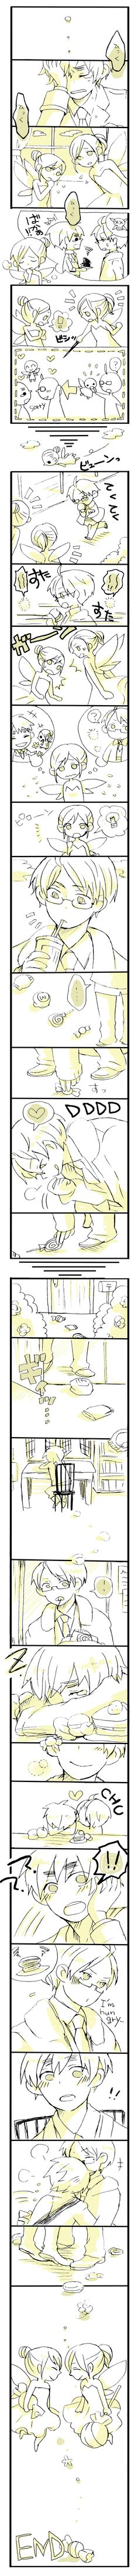 The Importance of the House Fairy by キラカkiraka - Hetalia - America / England     http://www.pixiv.net/member.php?id=1820435 <3